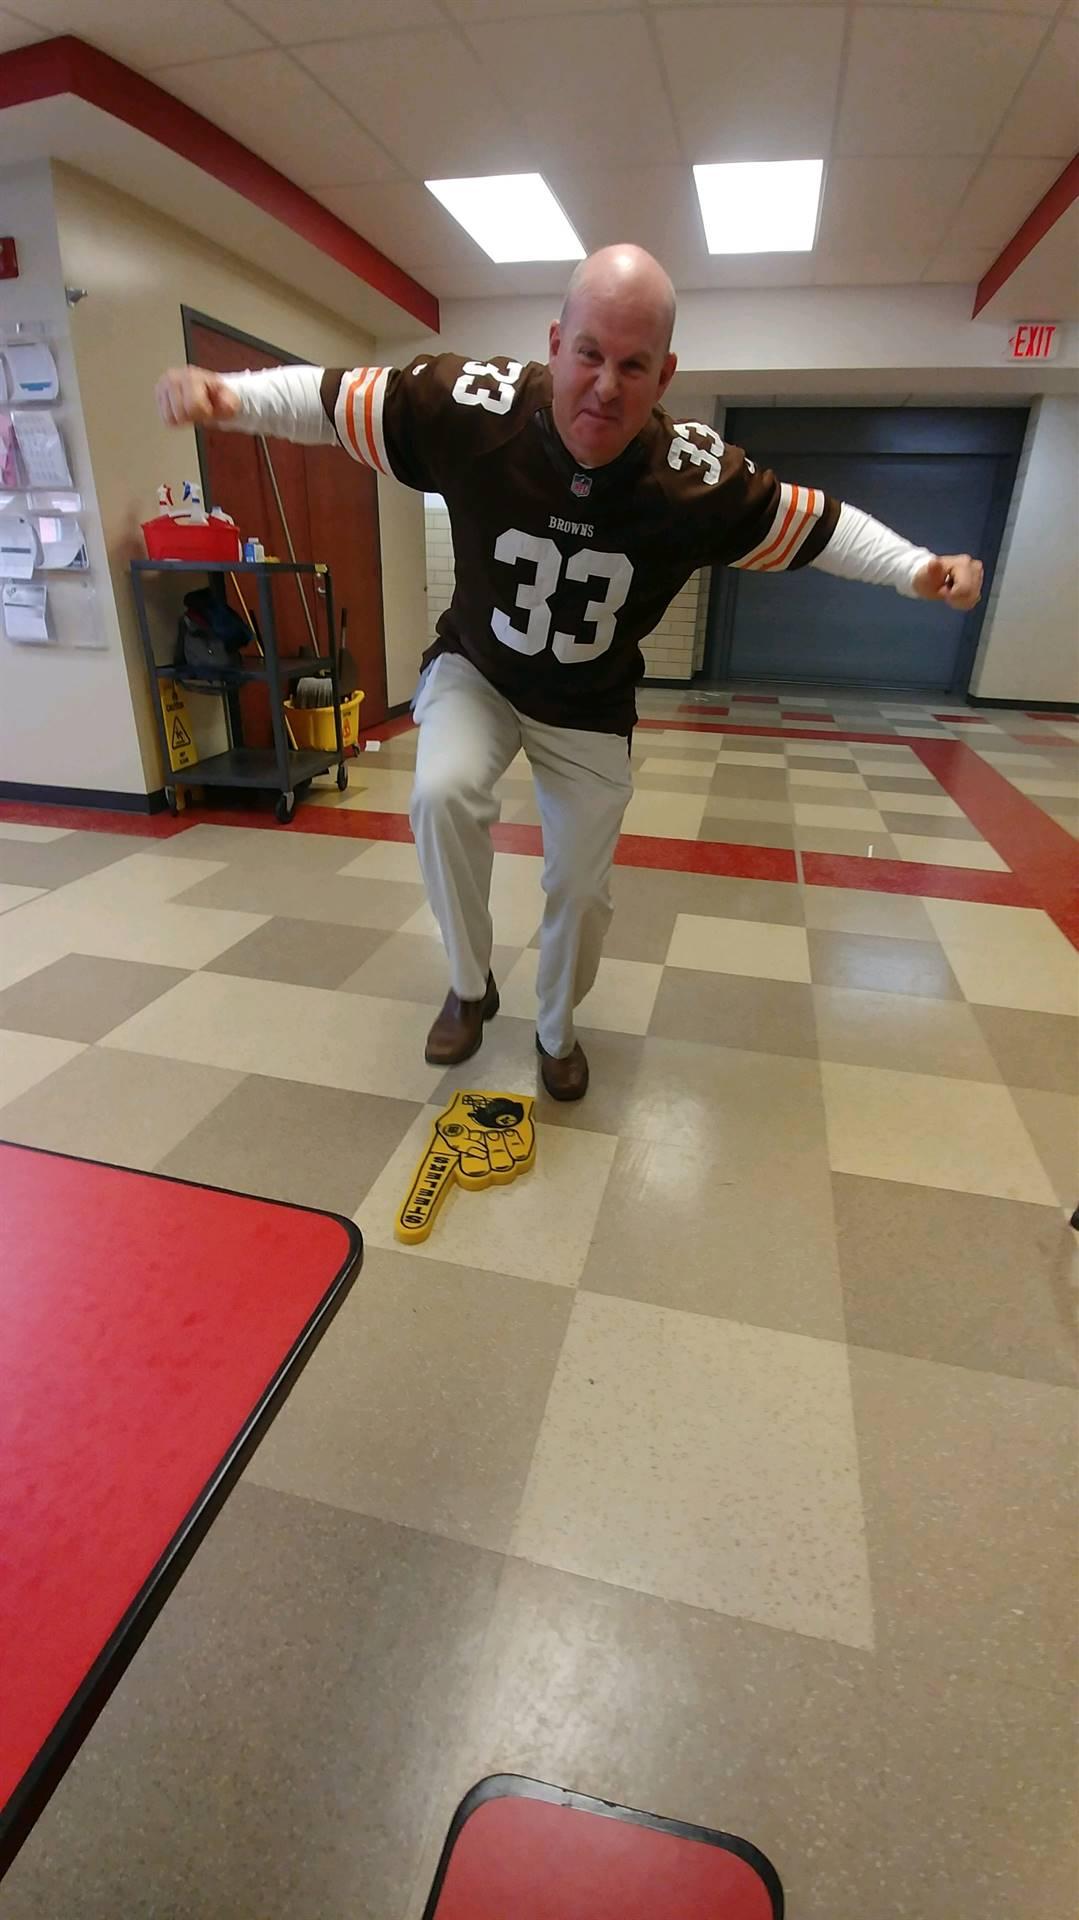 Mr. Dobbins has had enough of the Steelers' Foam Finger!